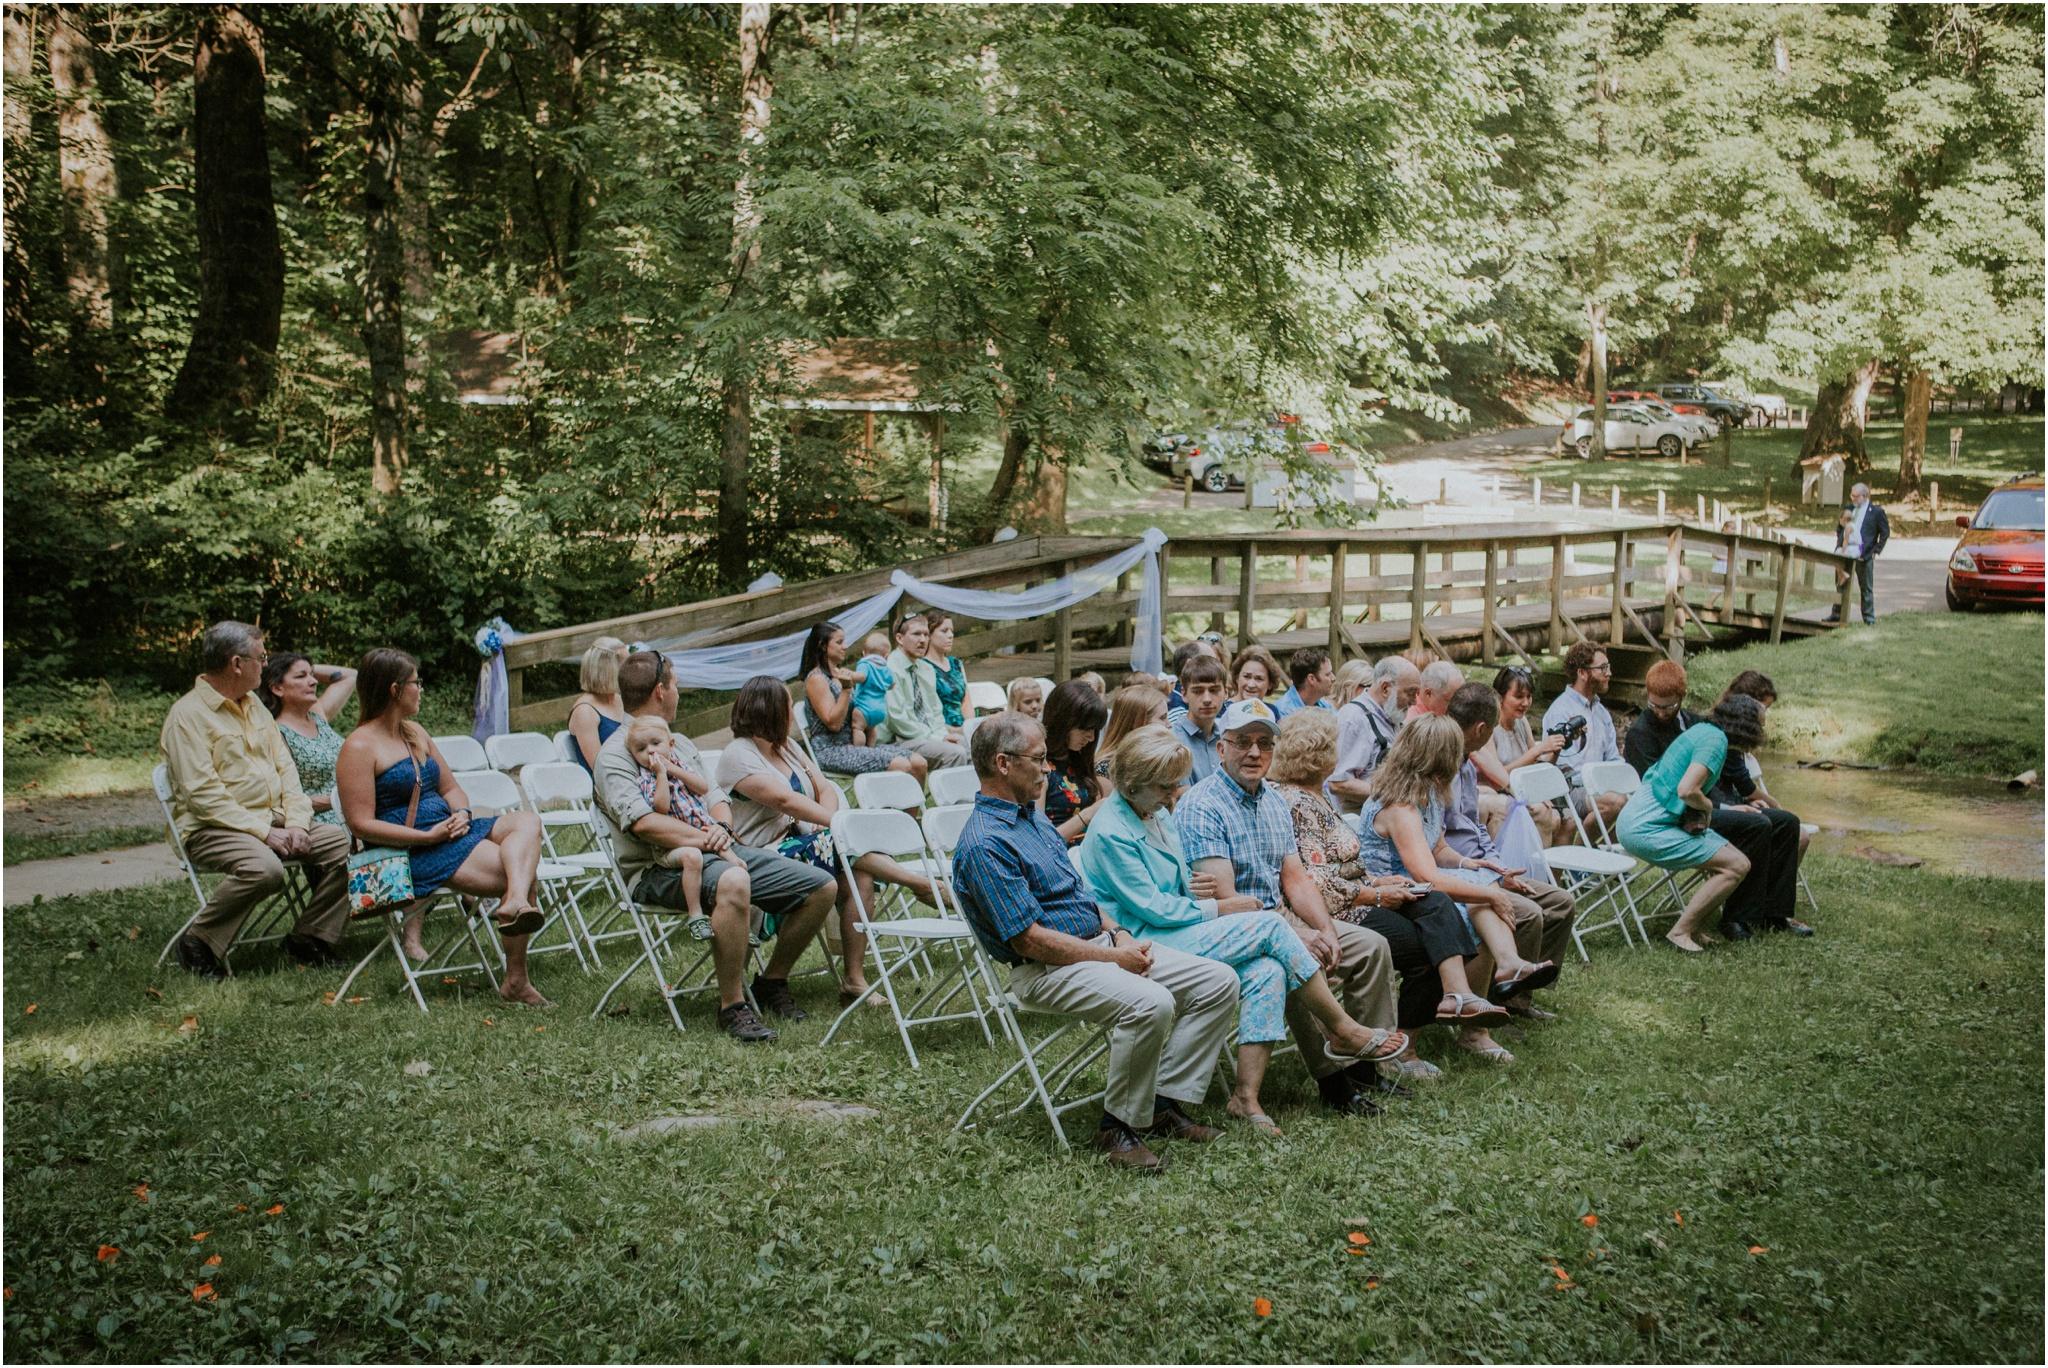 sugar-hollow-park-bristol-virginia-wedding-intimate-woodsy-black-forest-ceremony-adventurous-couple_0009.jpg